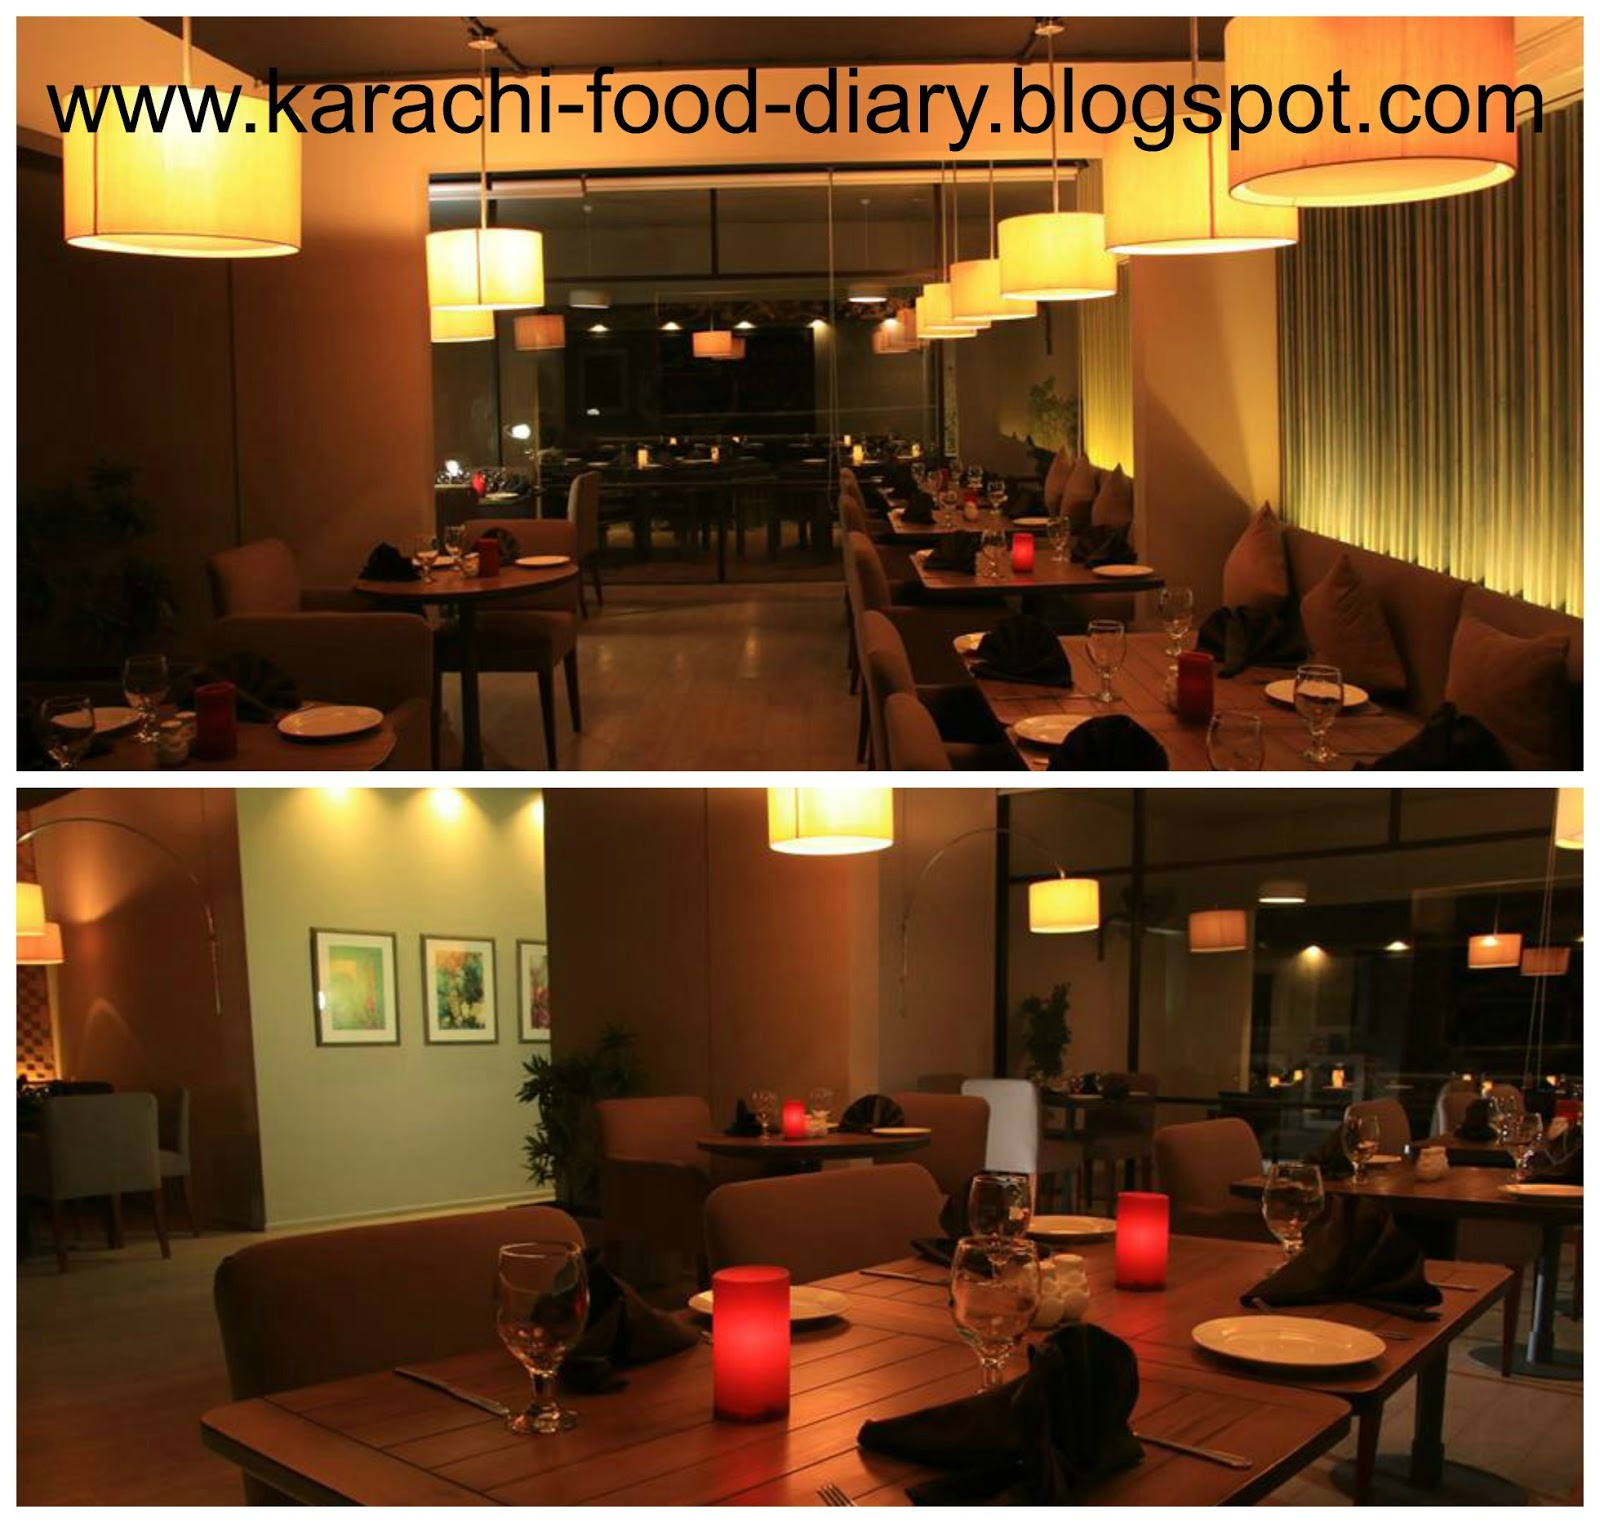 Karachi Food Dairy Casa Villa A Classy Fine Dining